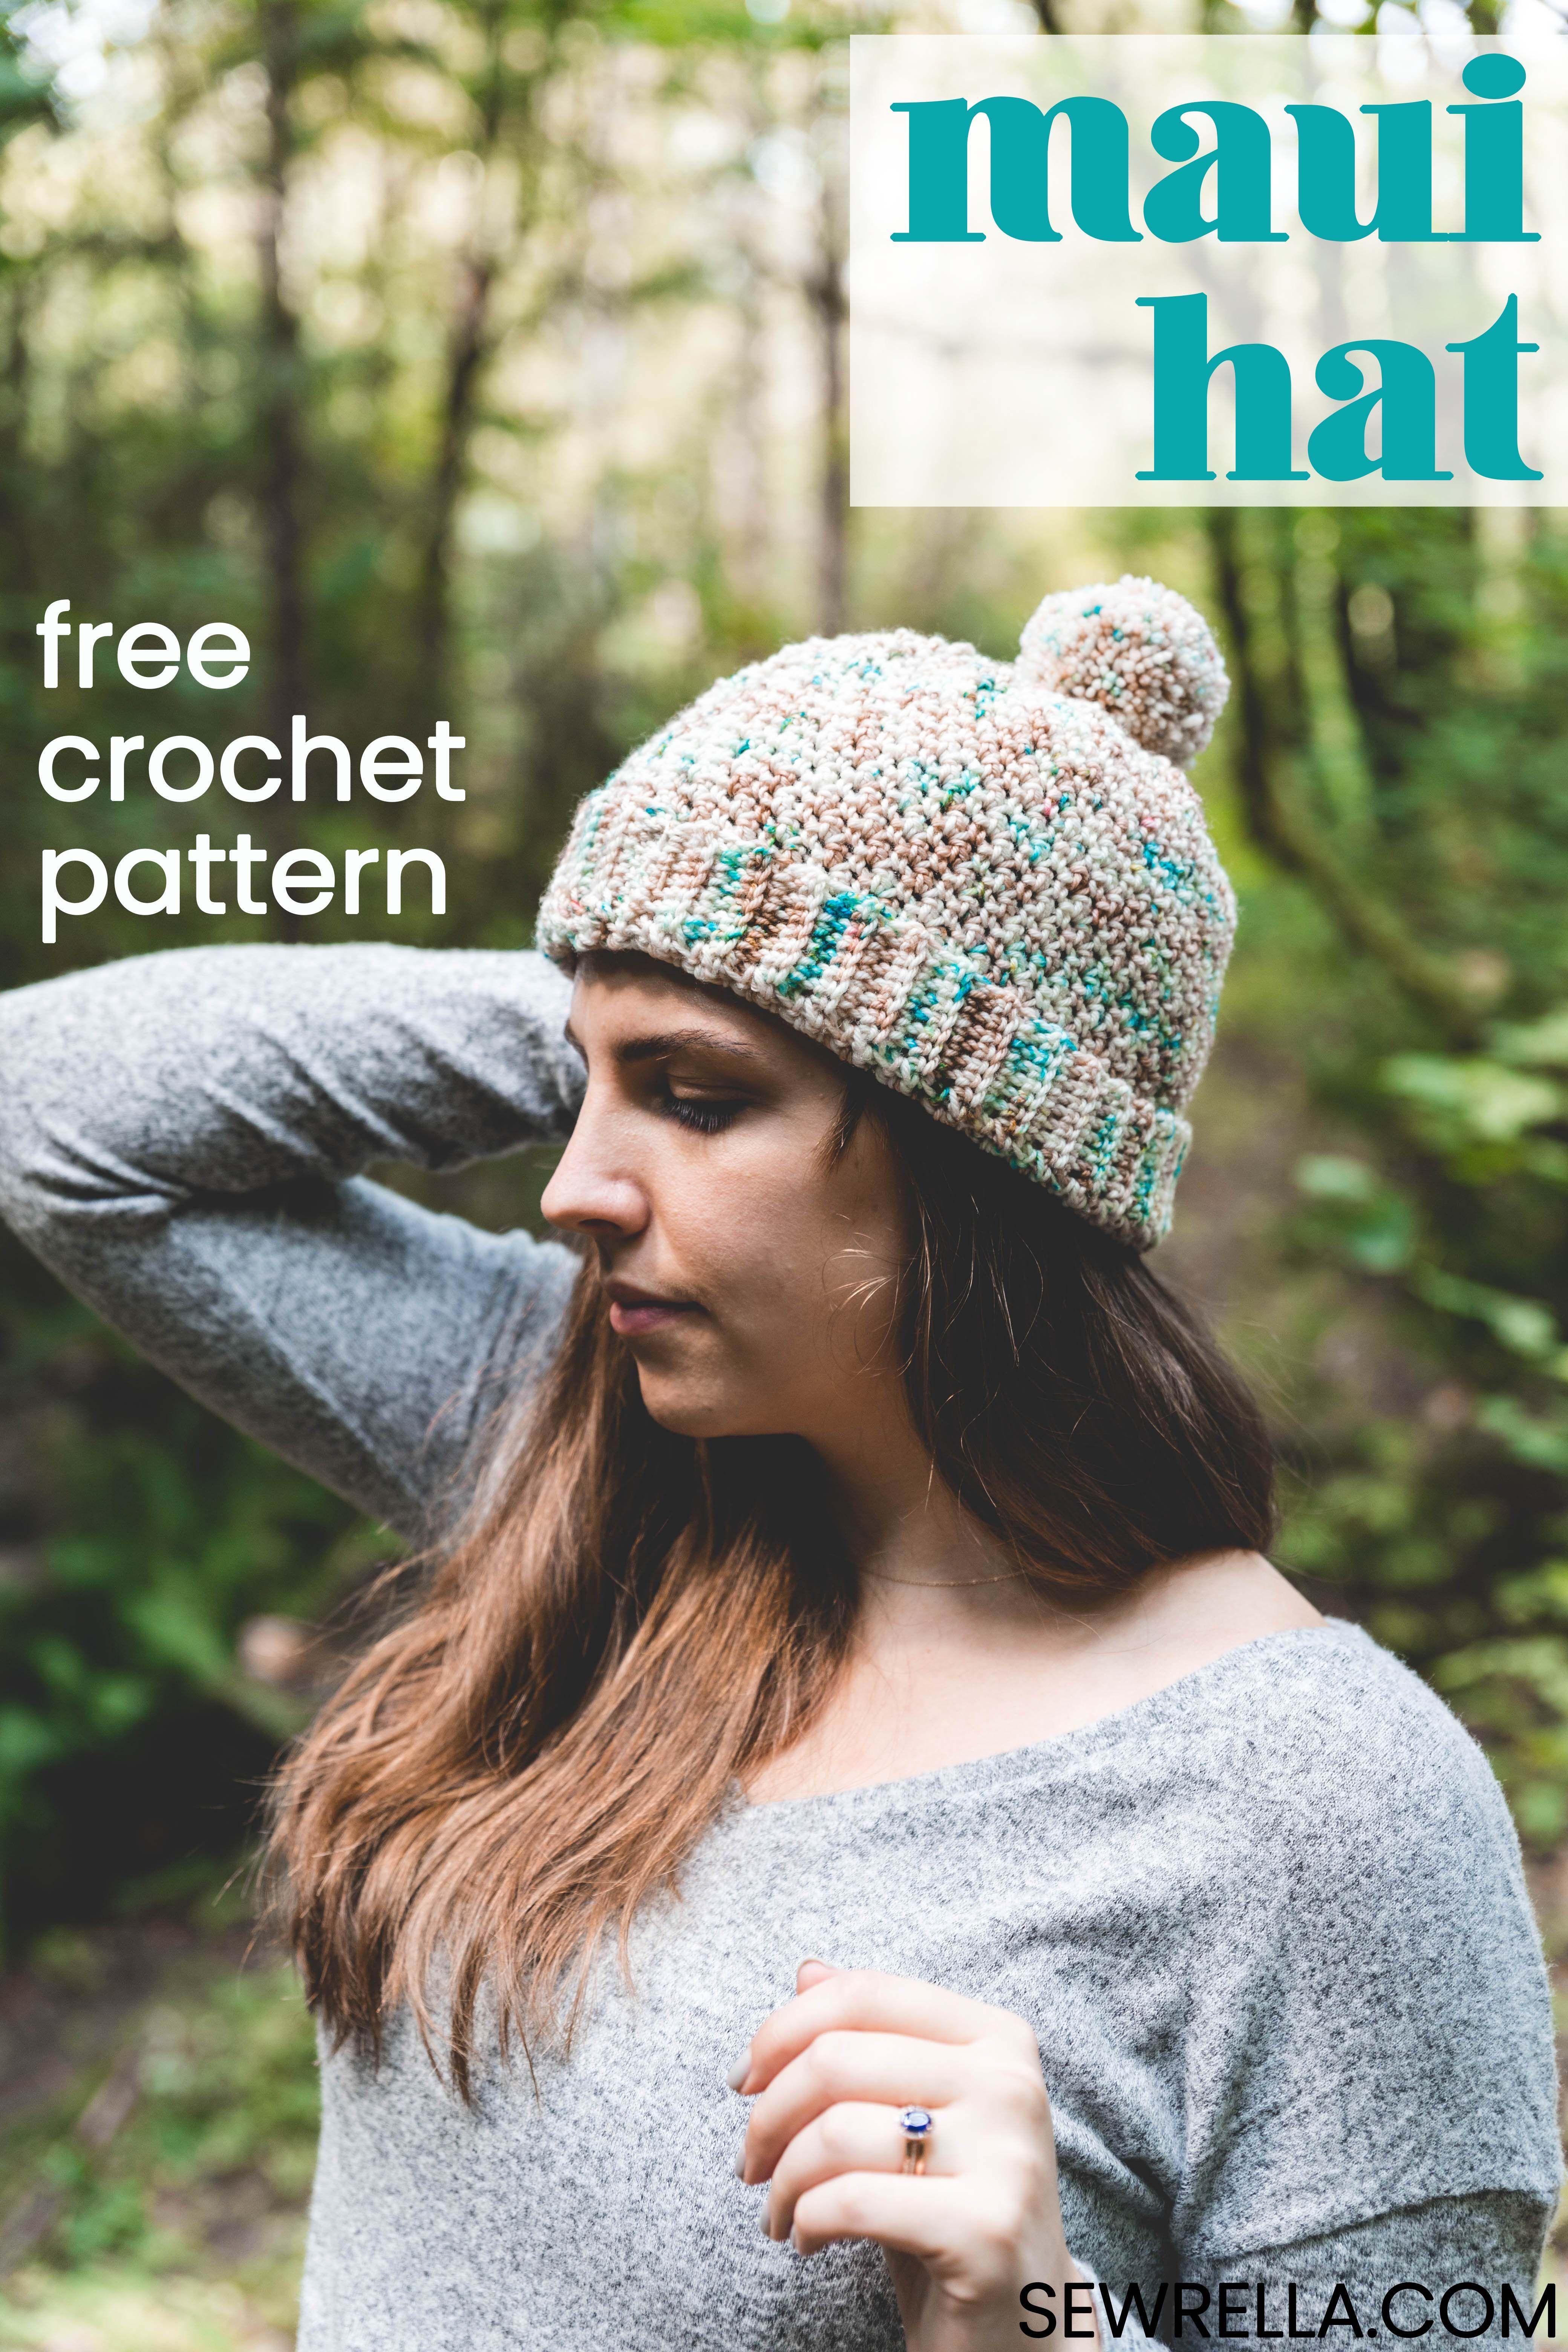 Crochet Maui Hat Pattern | Top Blogs - Pinterest Viral Board | Pinterest